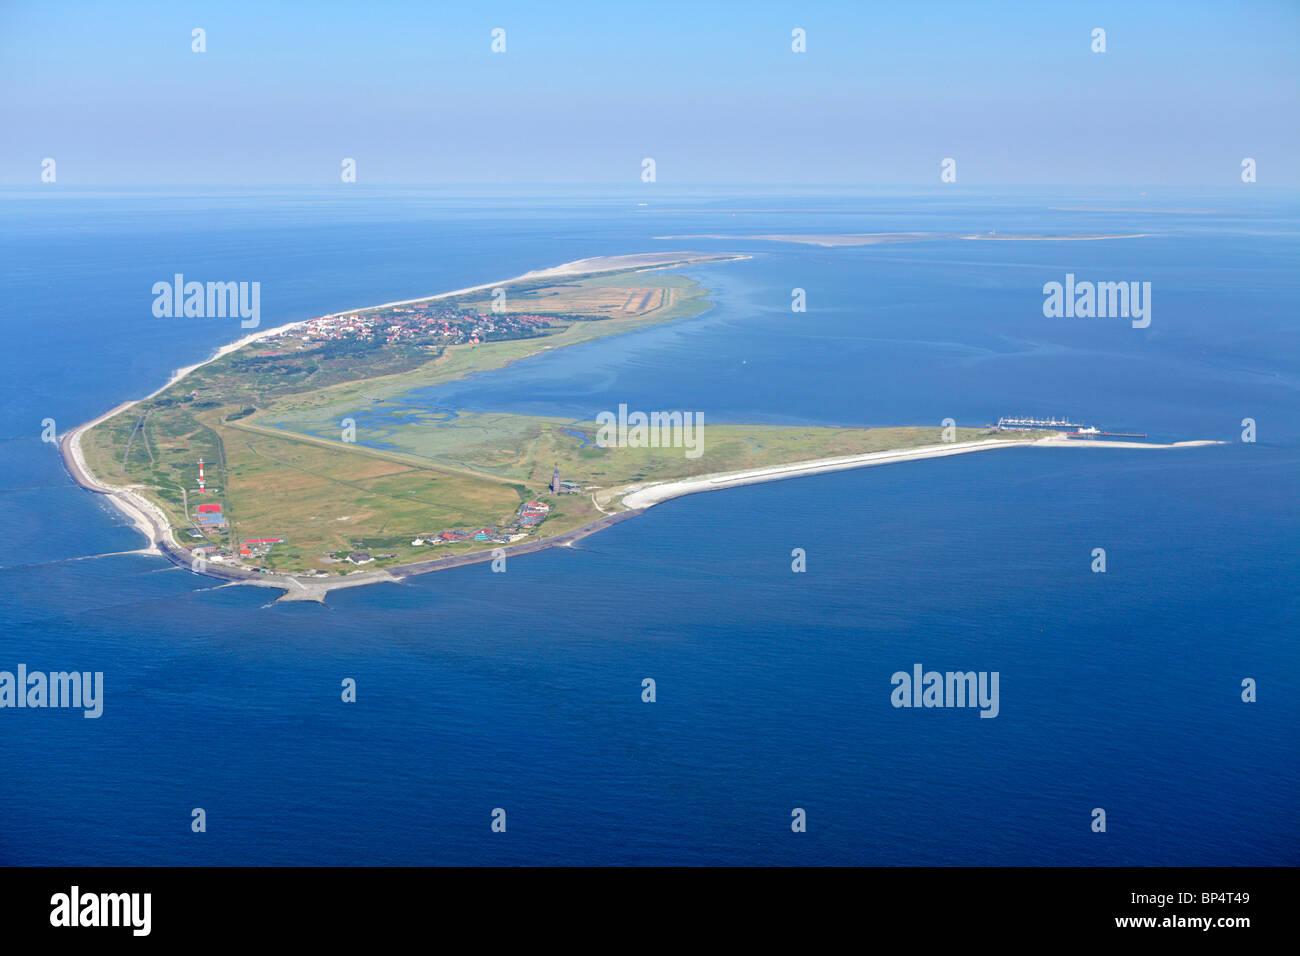 aerial photo of Wangerooge island, East Friesland, Lower Saxony, Germany Stock Photo